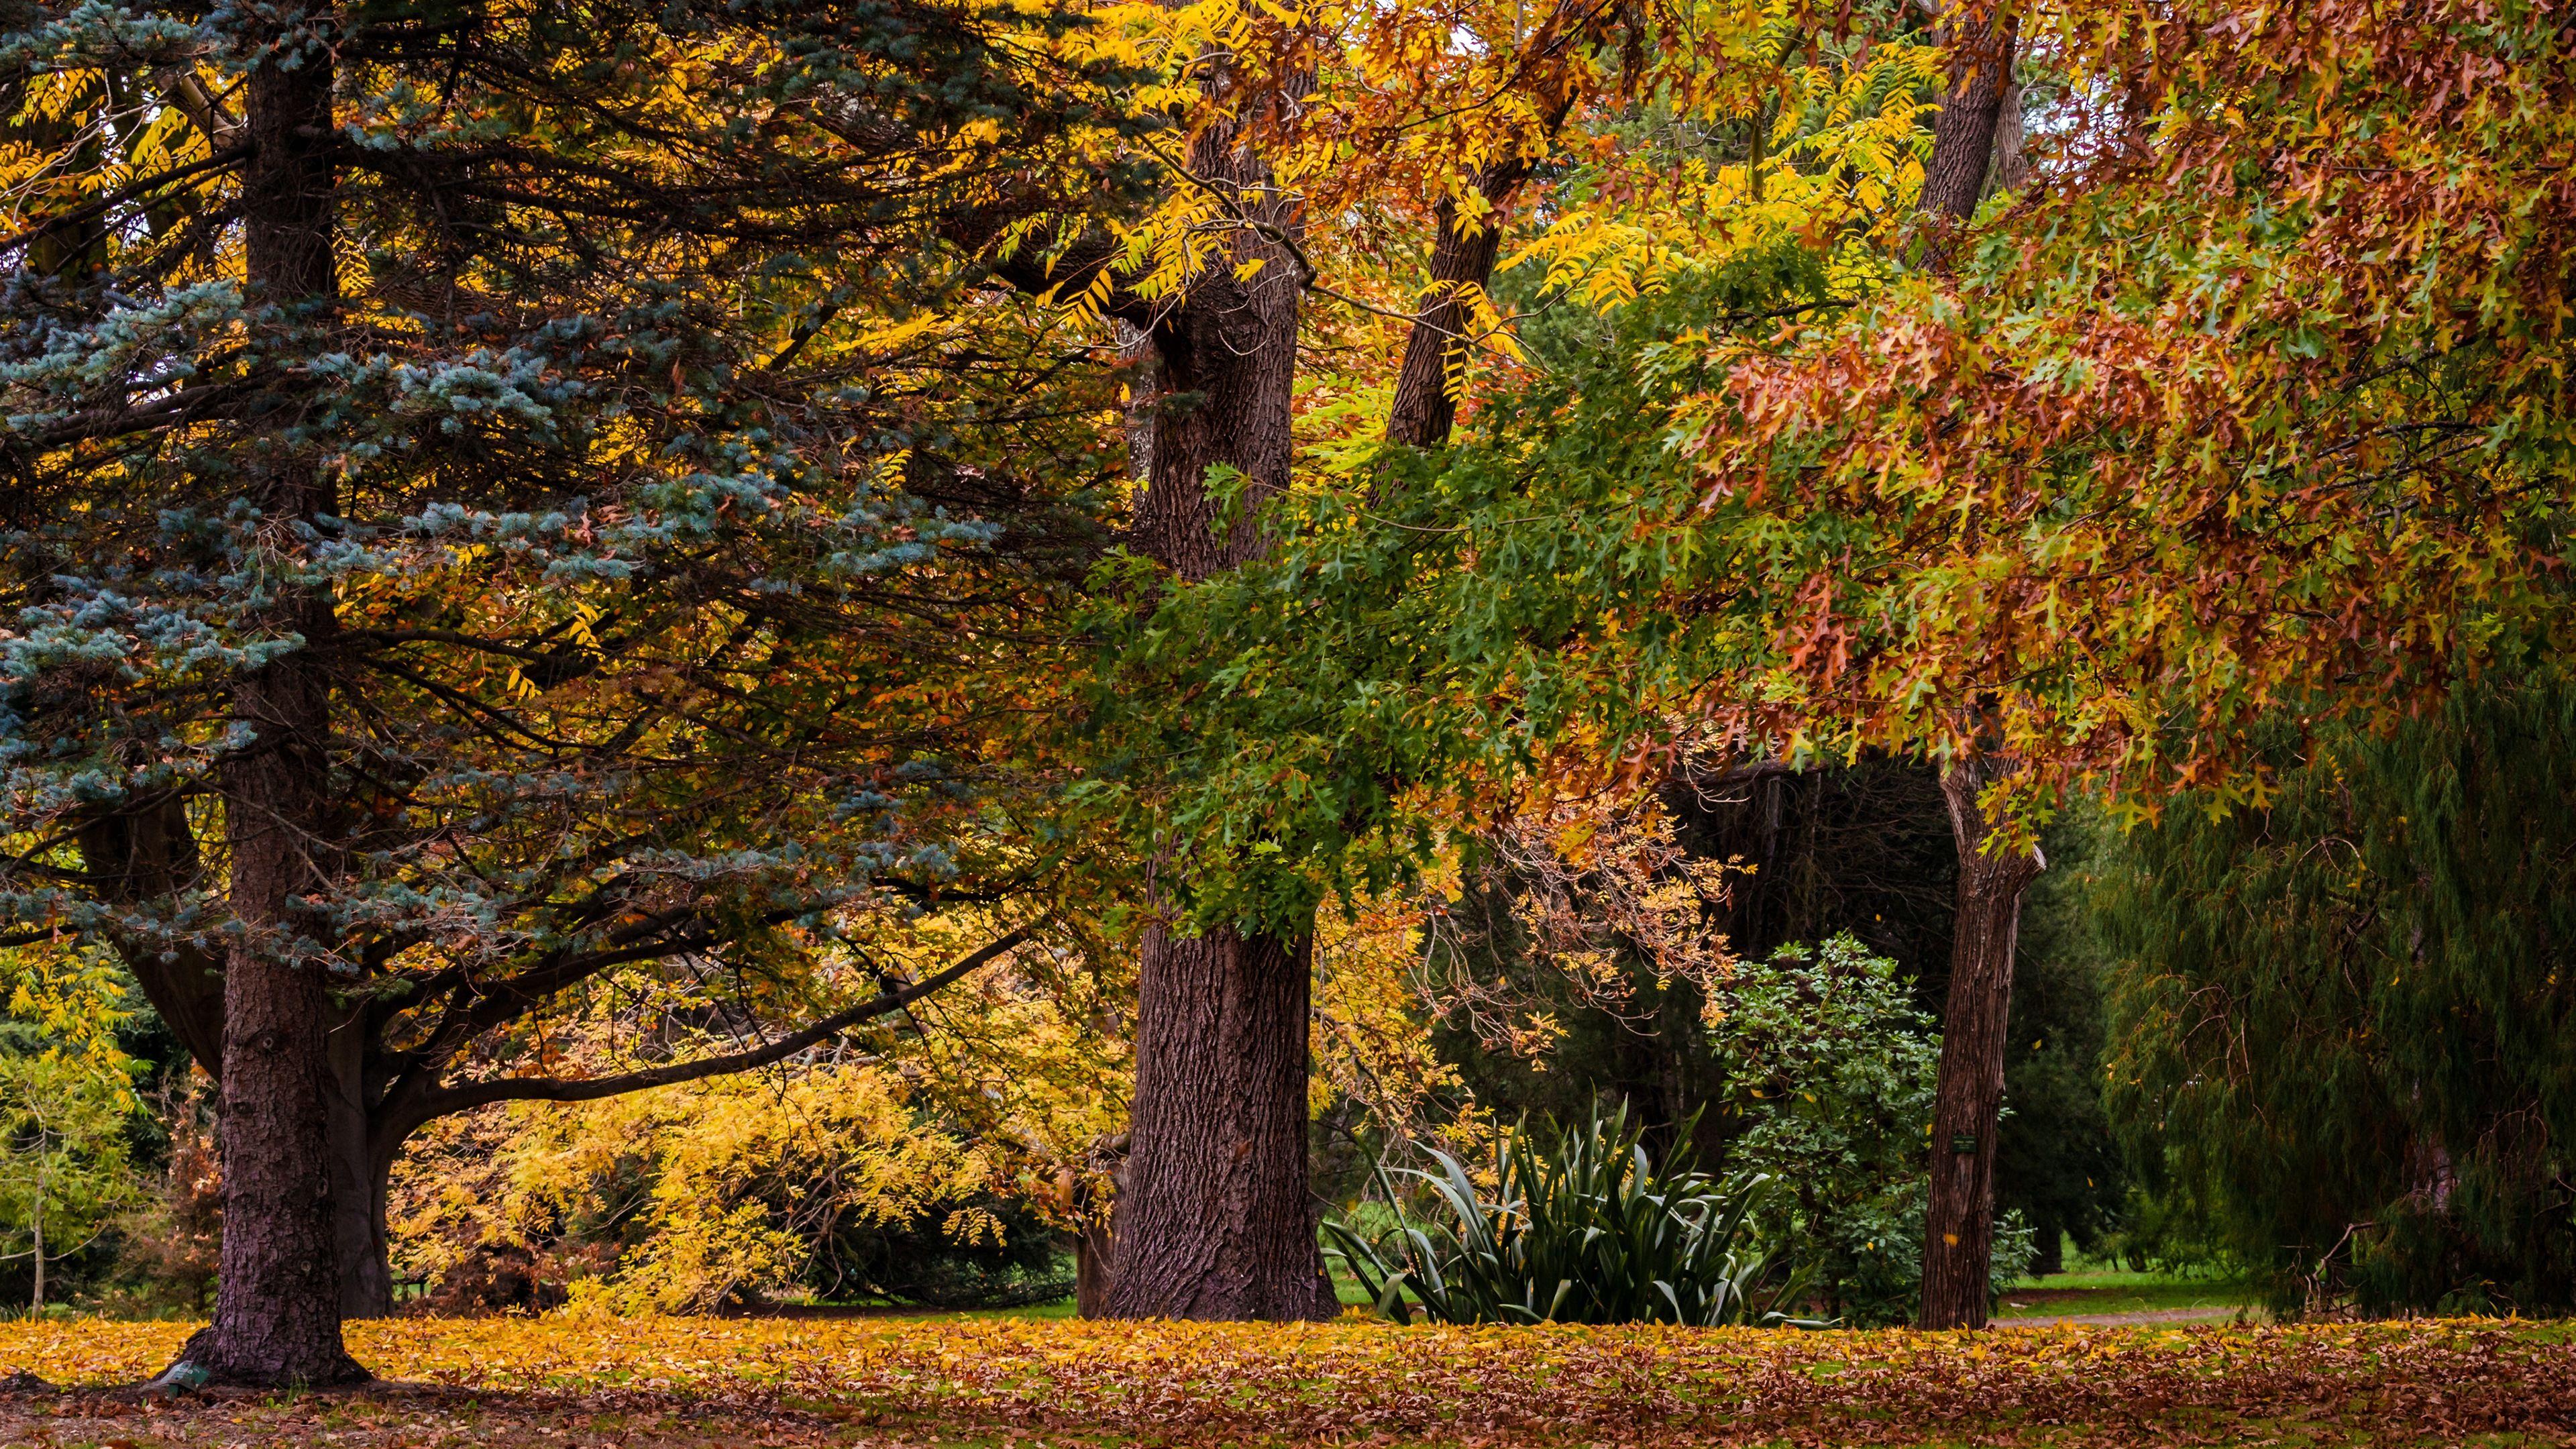 Falling Leaves Landscaping